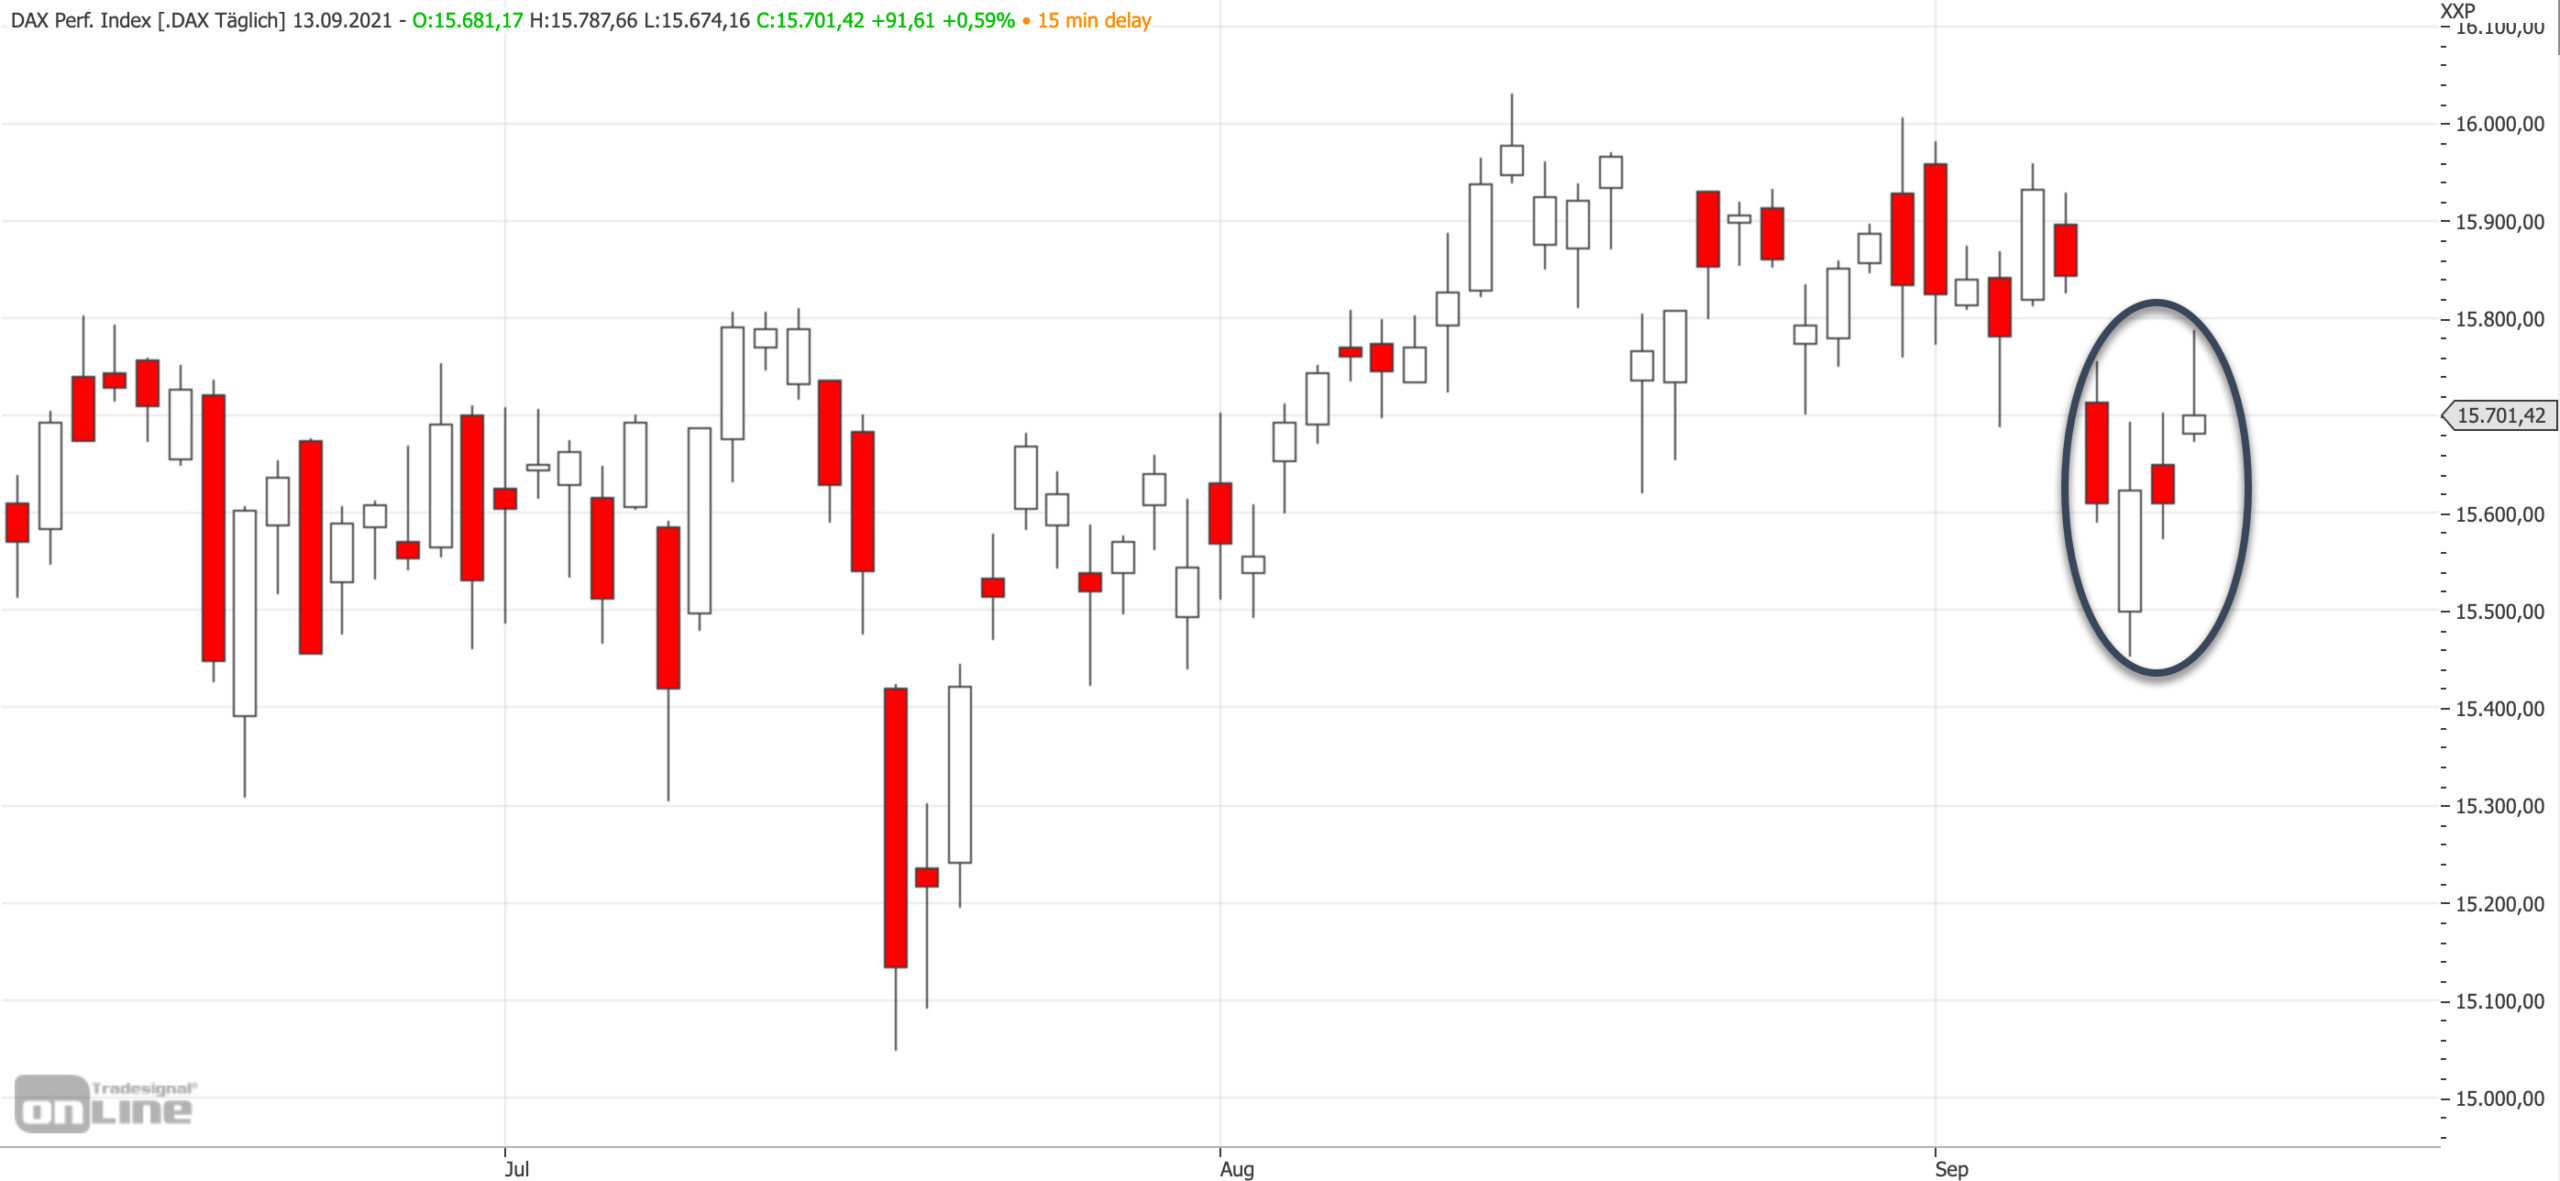 Mittelfristiger DAX-Chart am 13.09.2021